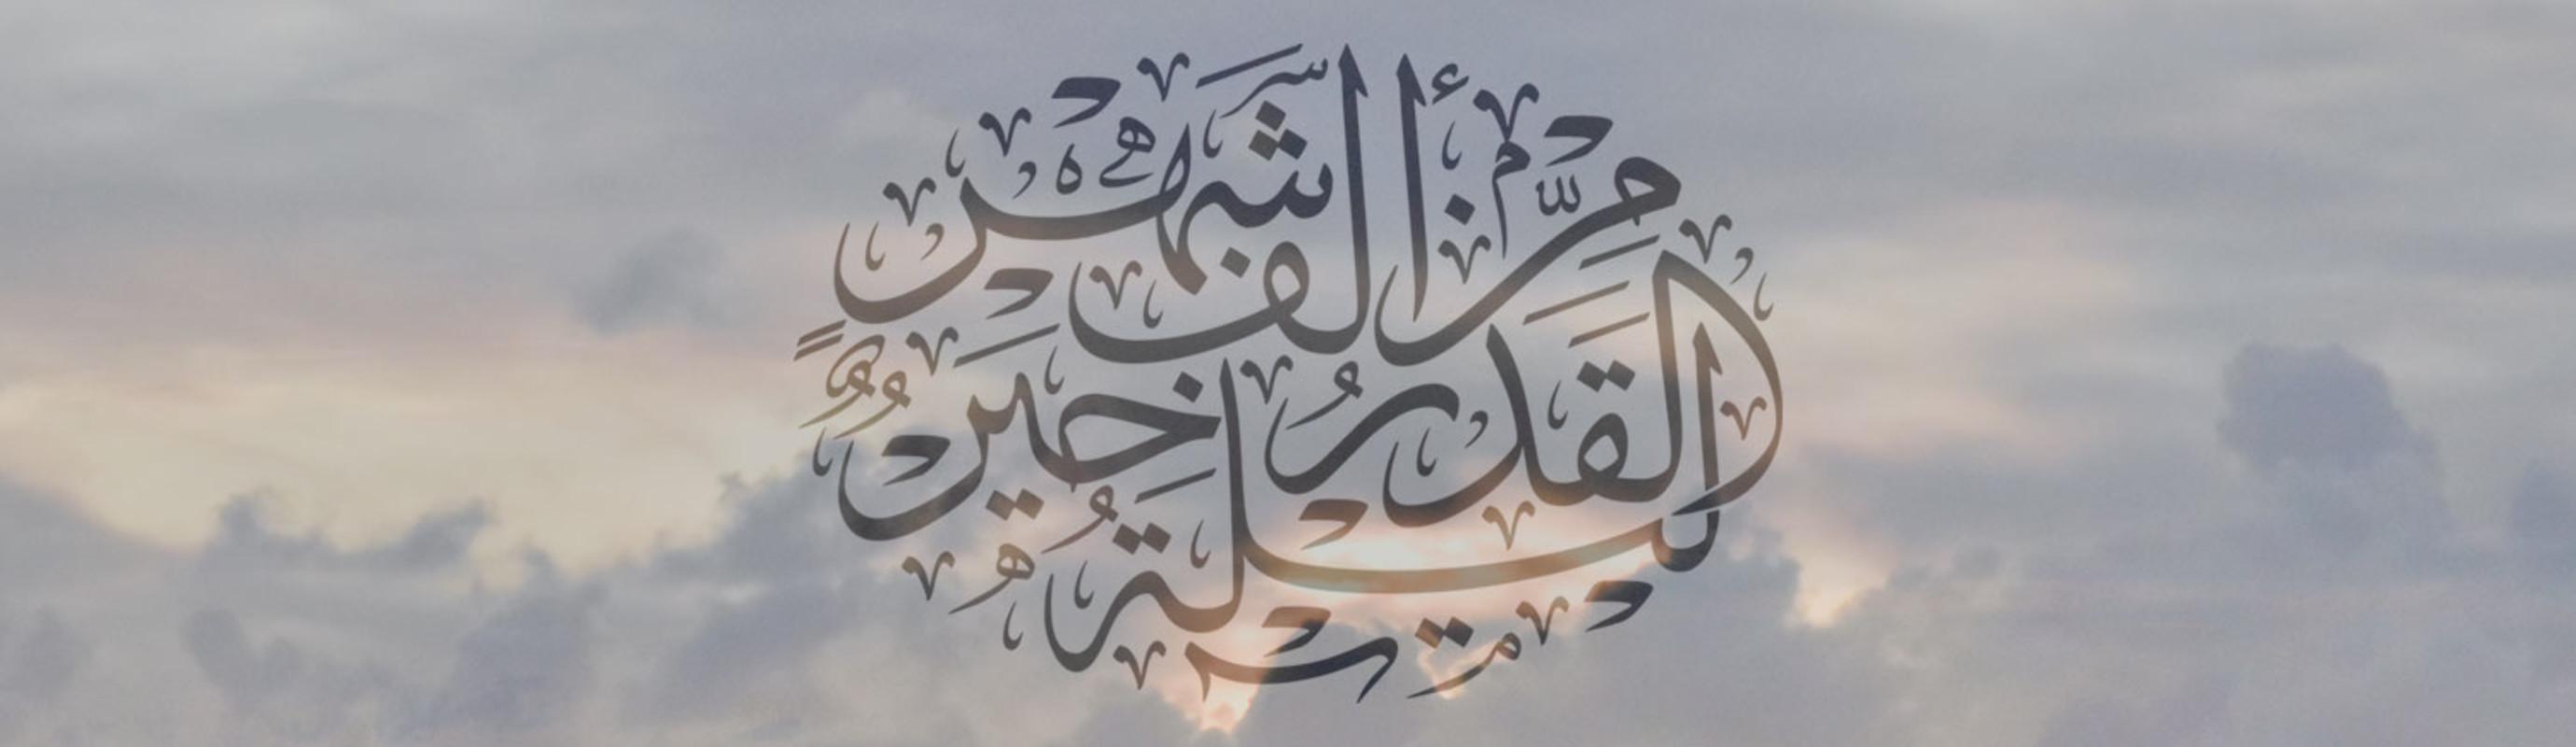 Eve of Ramadhan 21, possible night of Qadr.